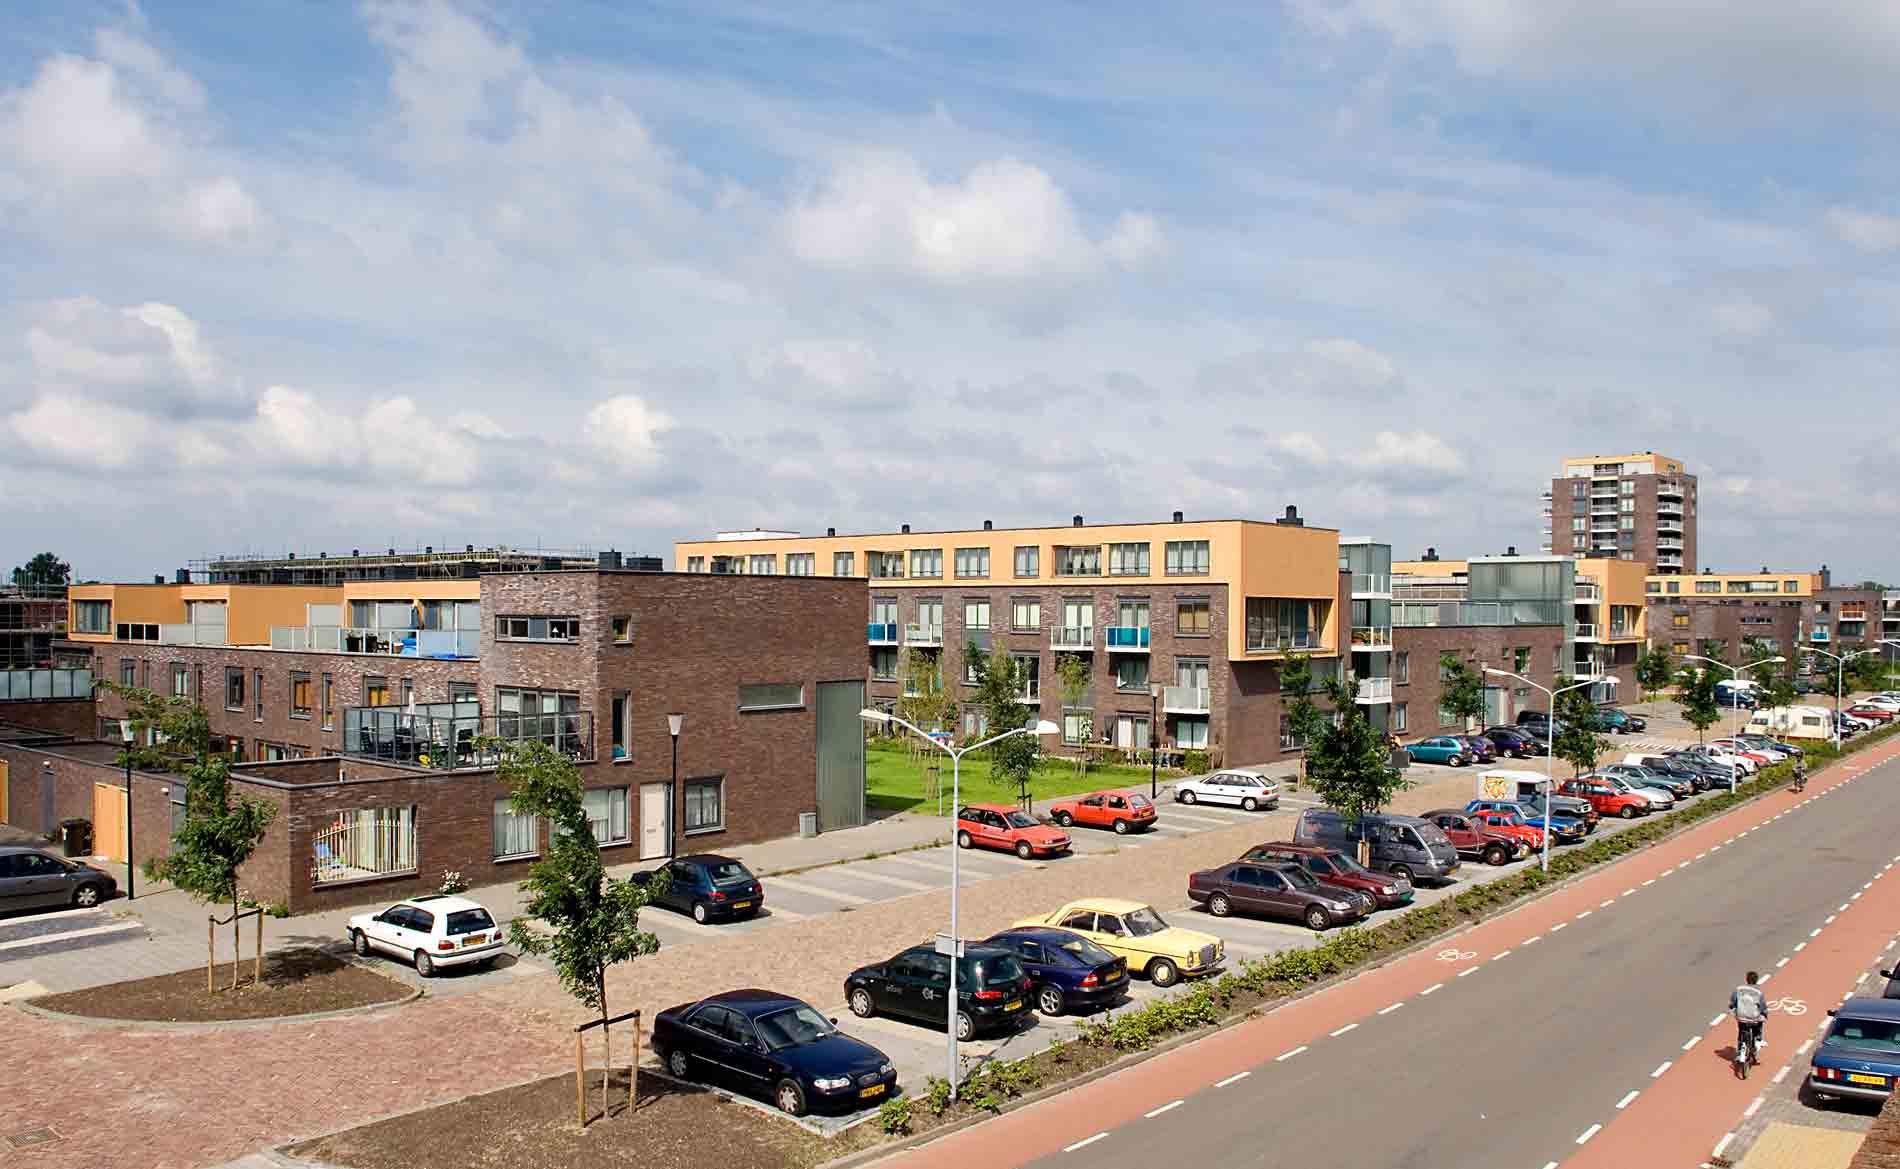 Prinsenhof Beverwijk Herstructurering wonen BBHD architecten